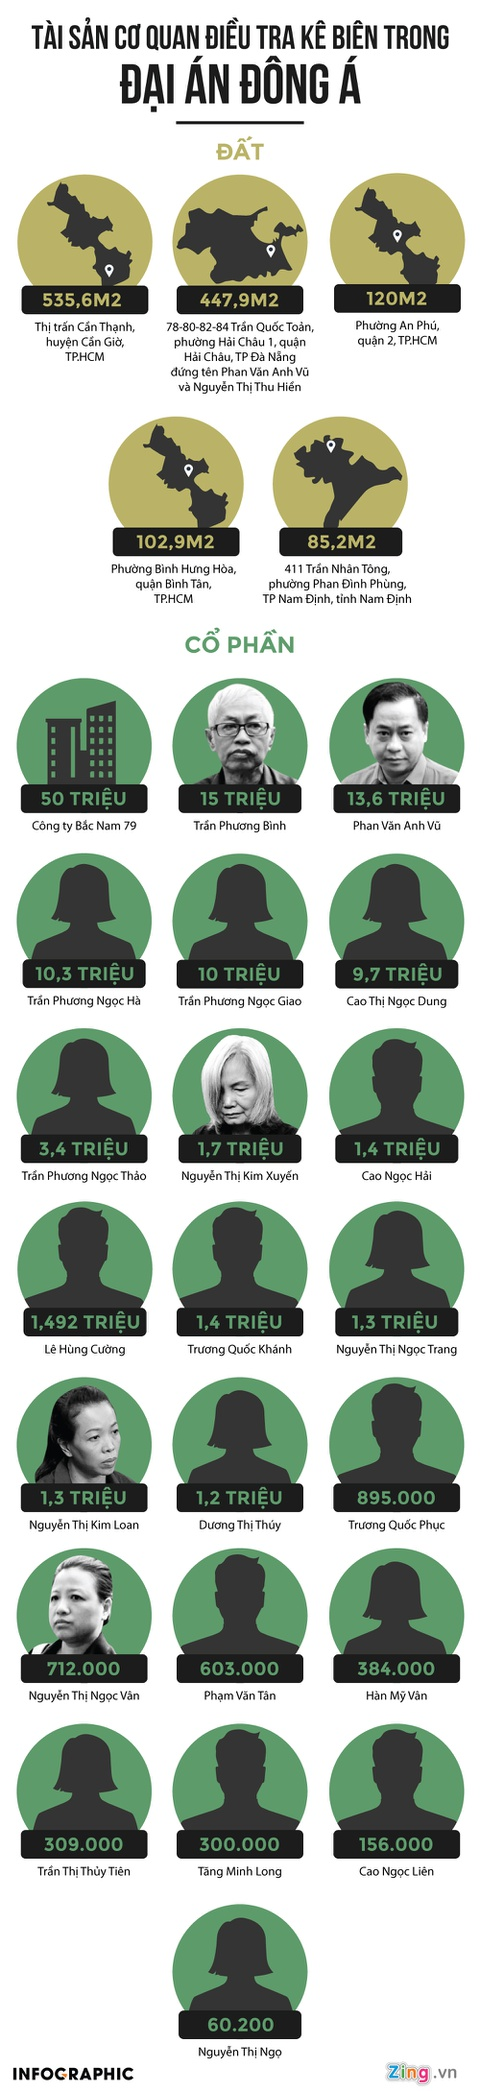 Vu 'nhom', Tran Phuong Binh bi ke bien nhung gi? hinh anh 1